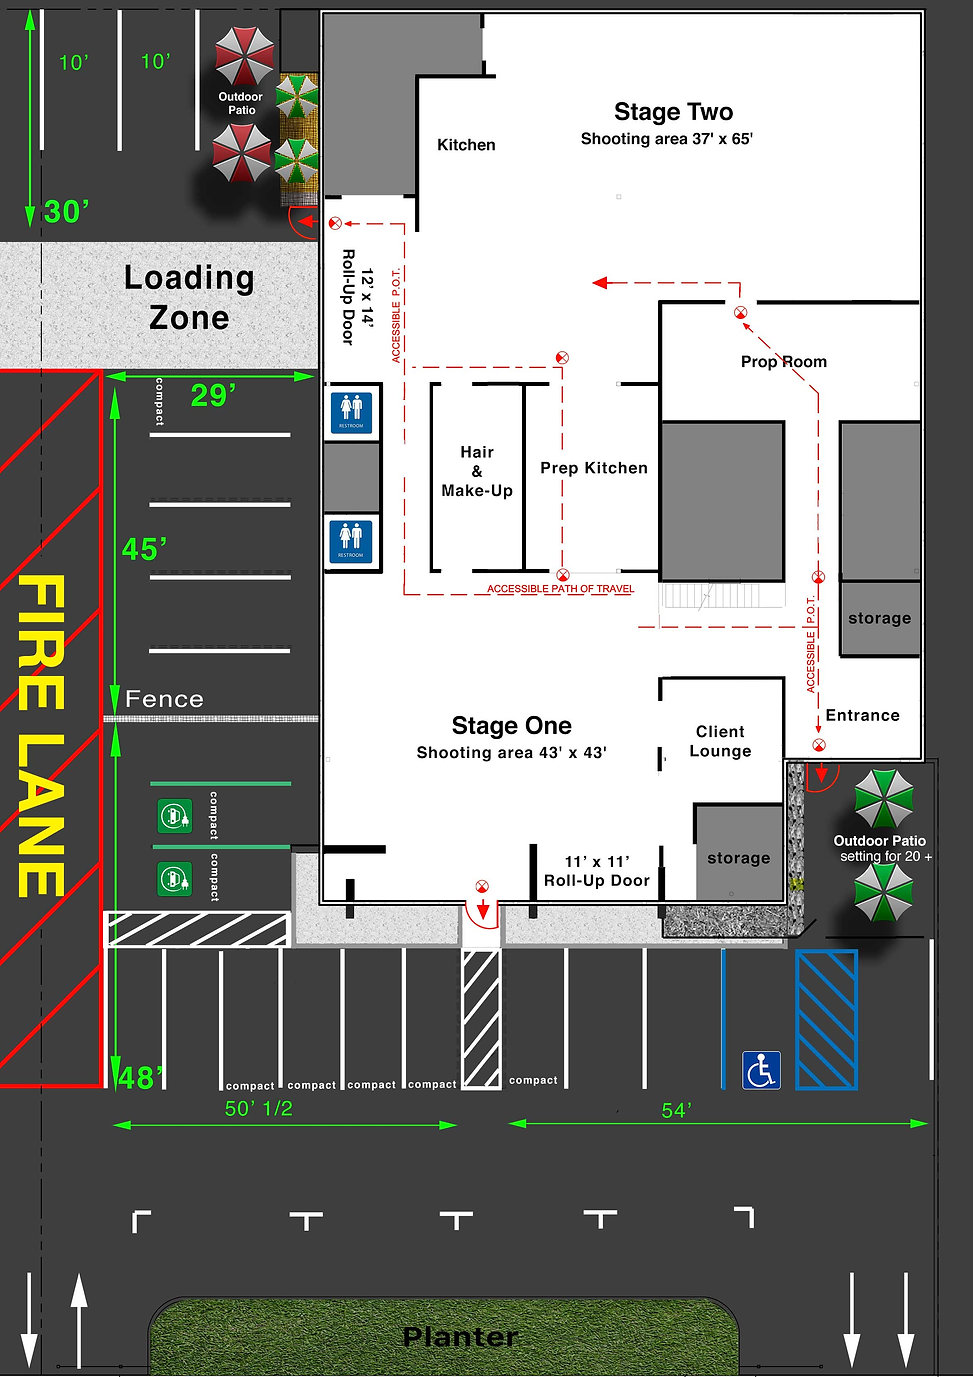 Parking-Floor-Plan-06-2021-Layout.jpg